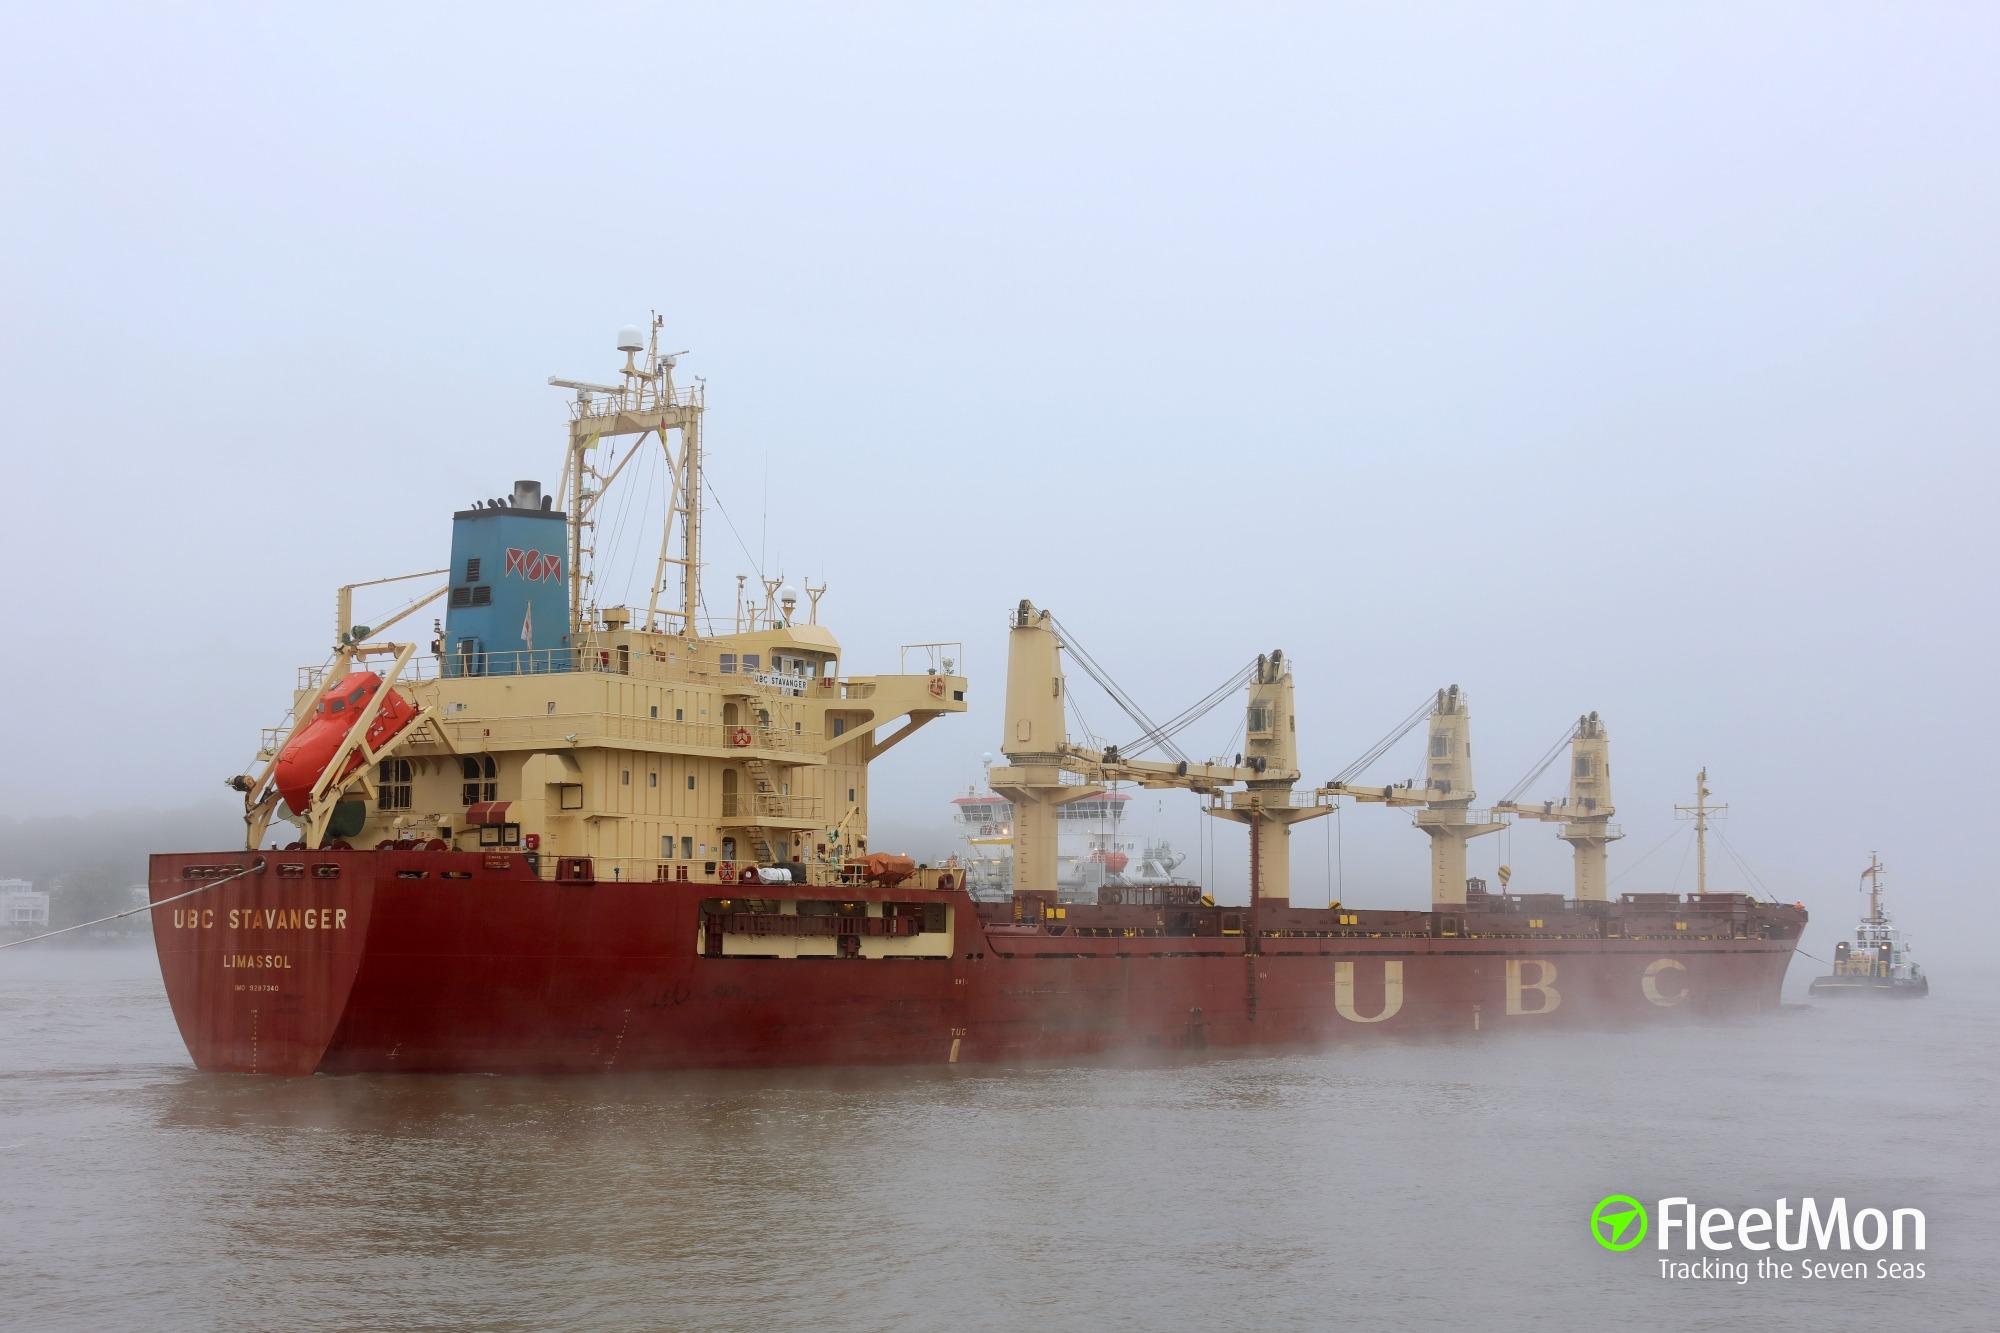 Msm cargo tracking - Ubc Stavanger